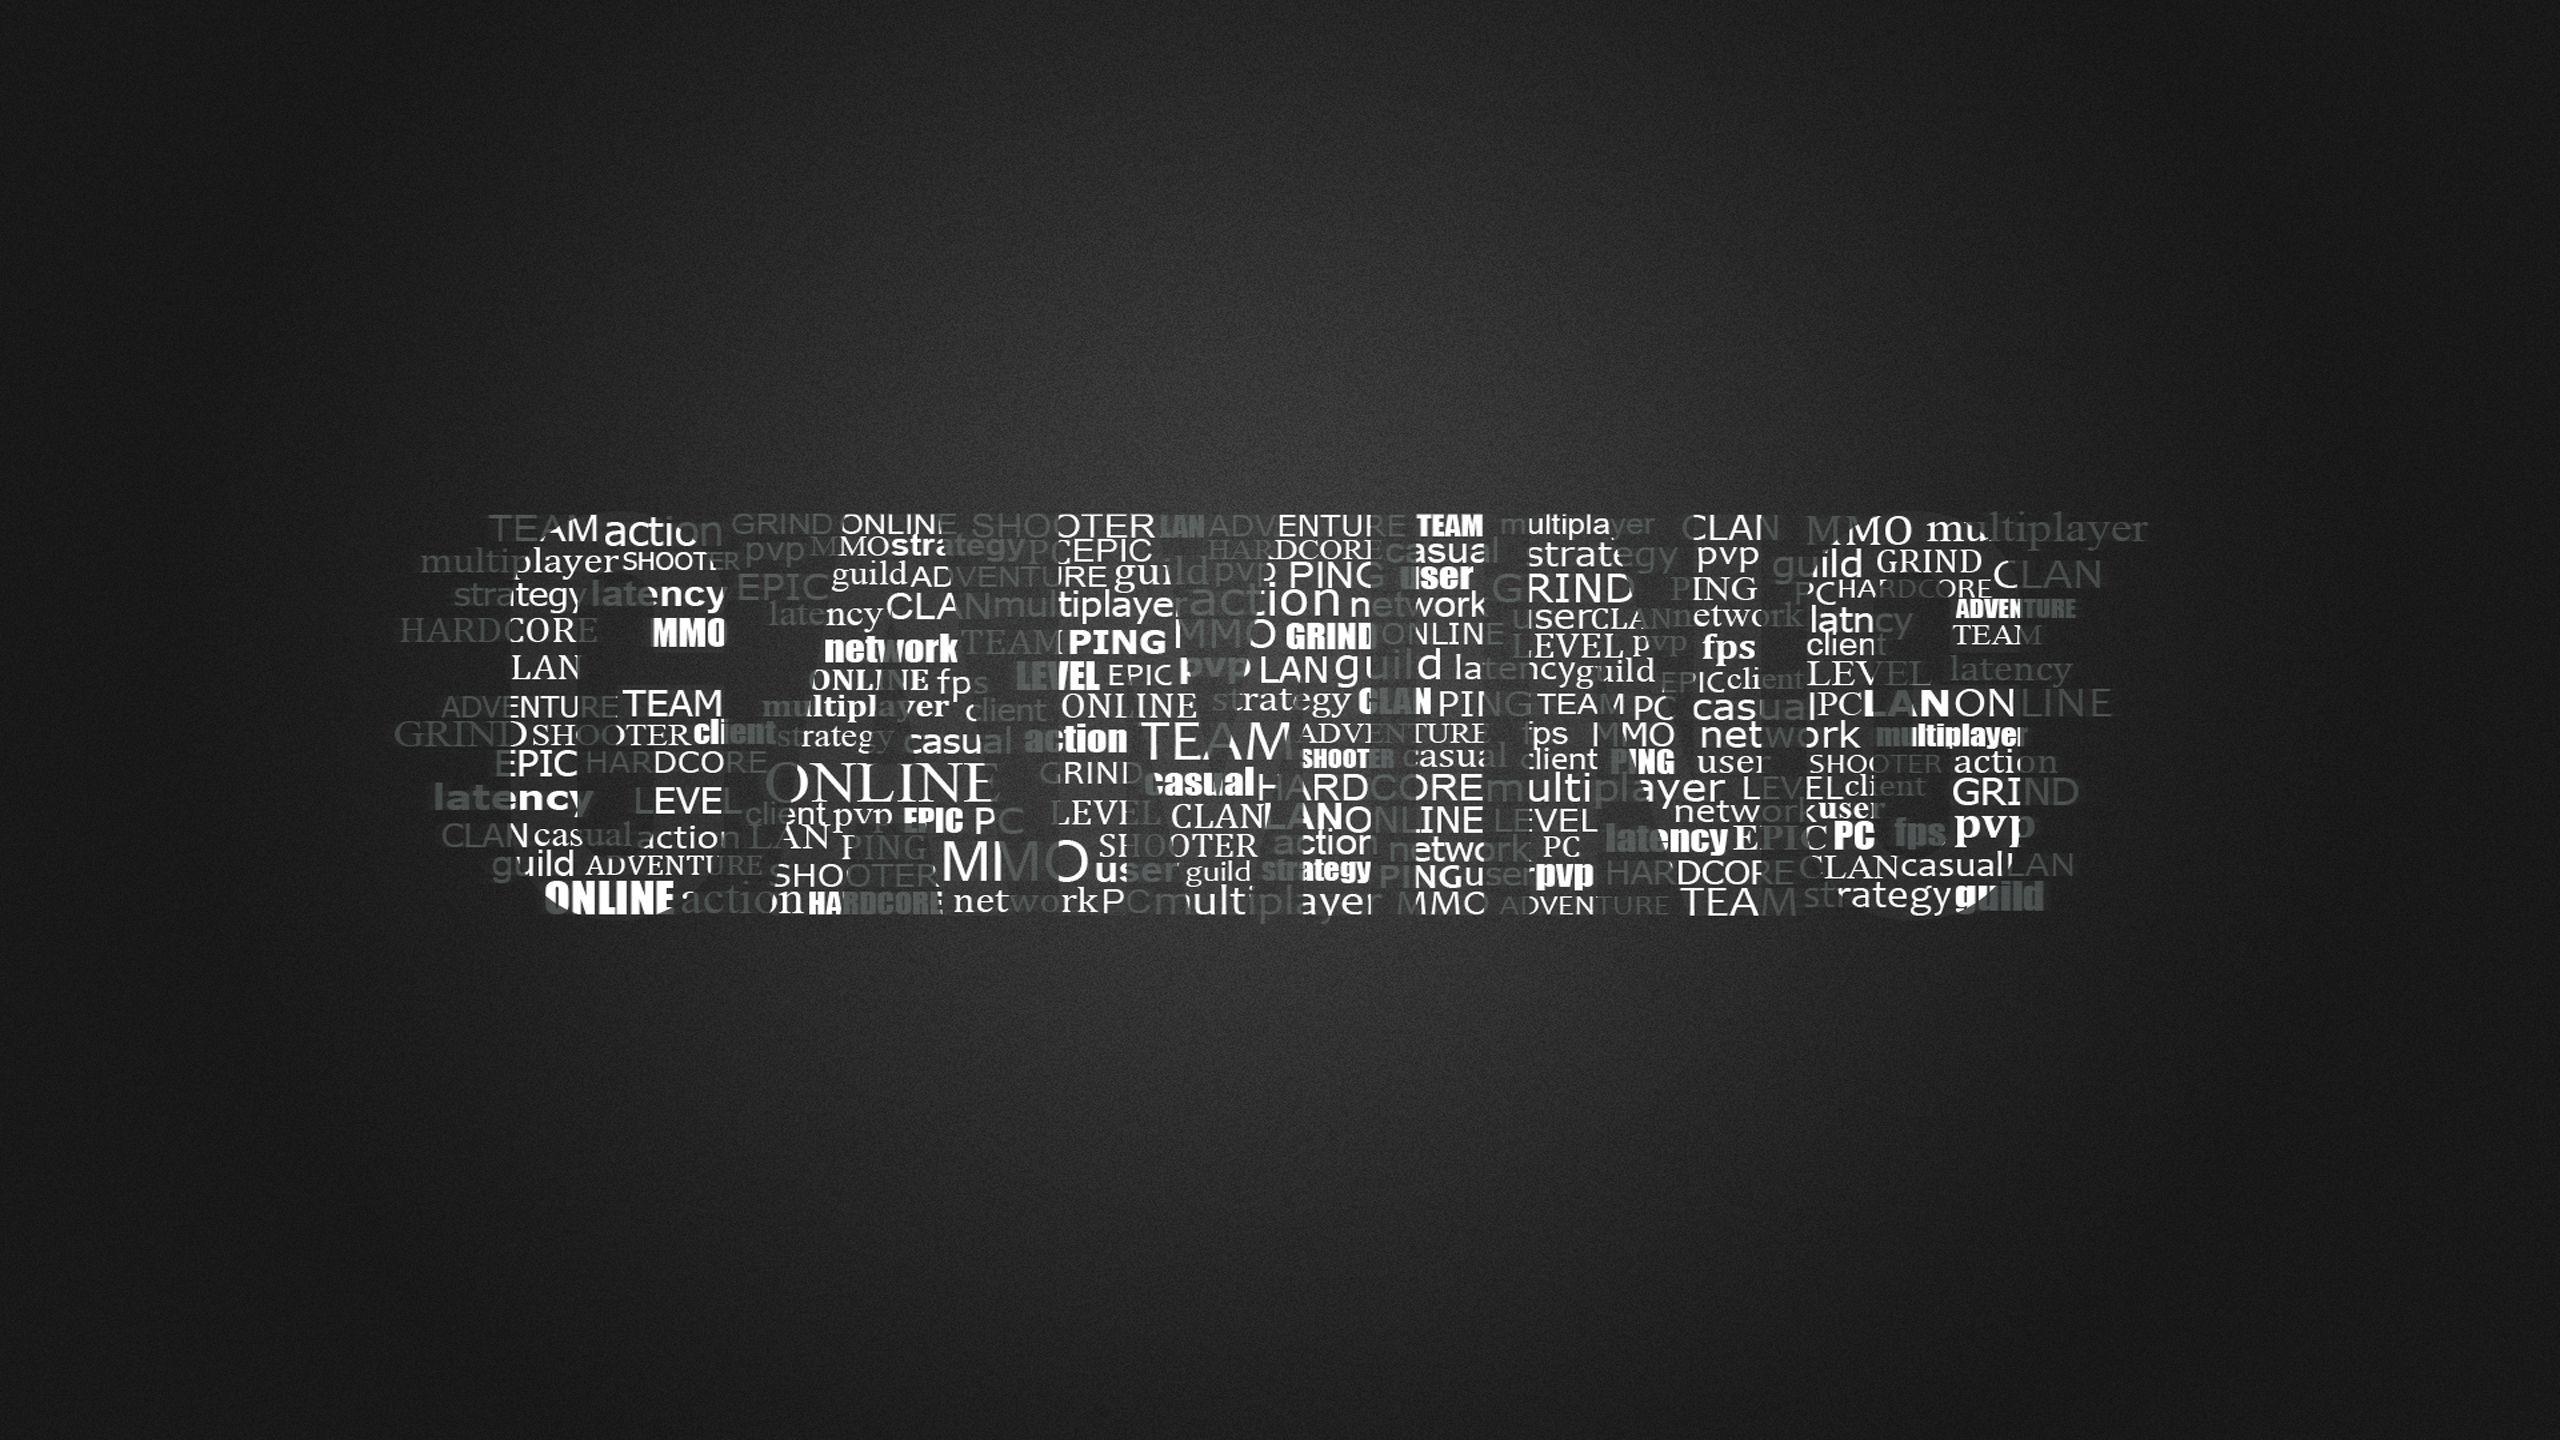 2048×1152 gaming wallpaper 0 HTML code. 2560 x 1440  https://i.imgur.com/1SzBC.jpg